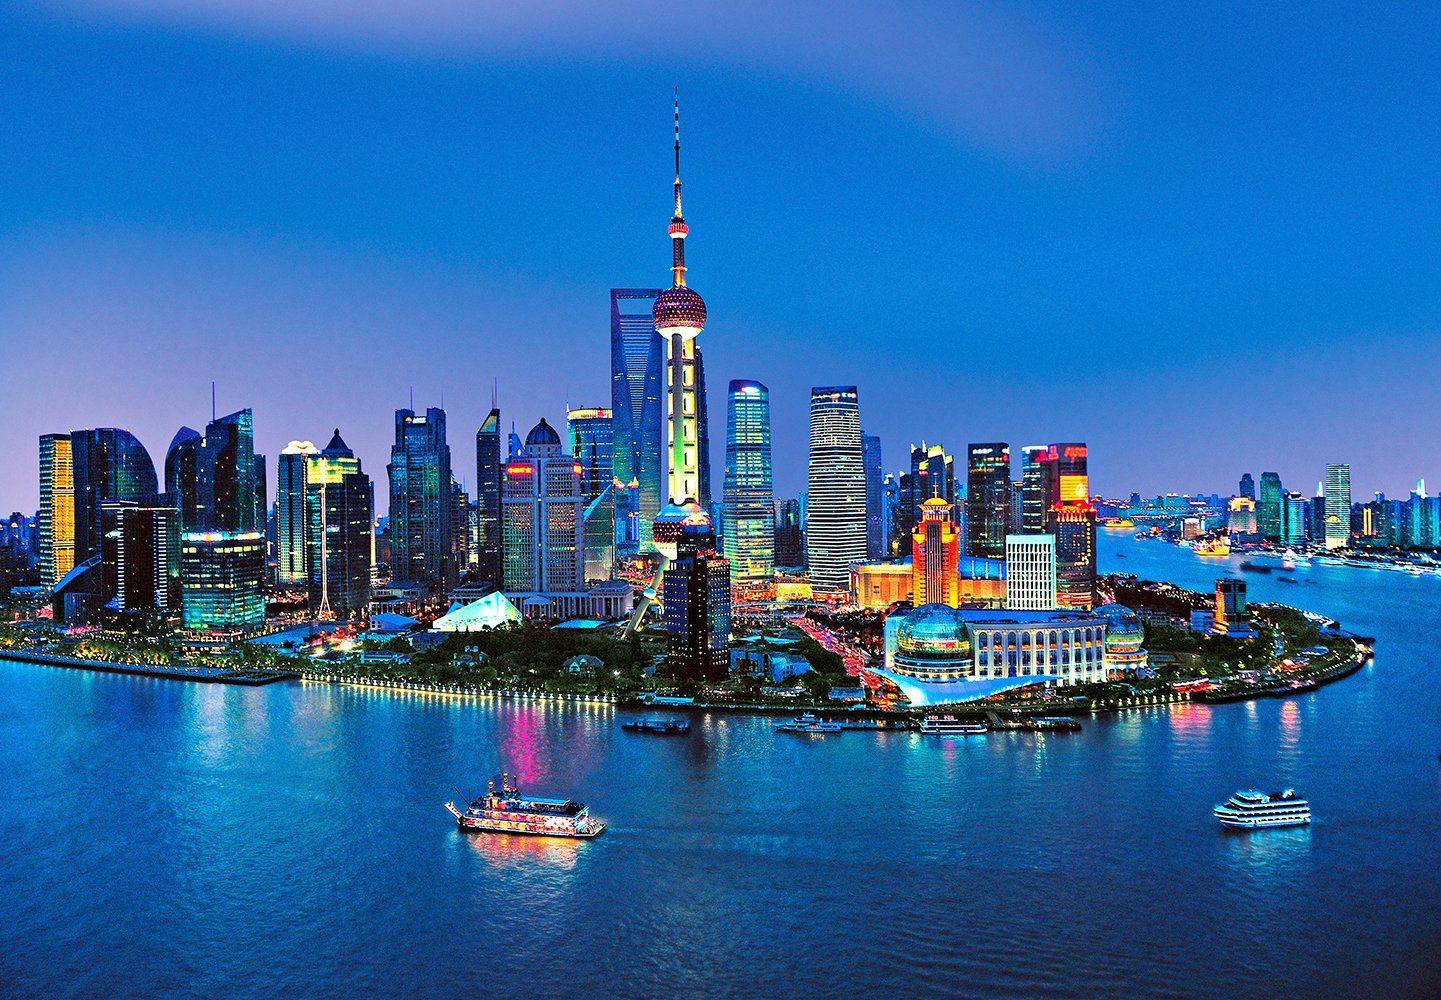 Fototapete »Shanghai Skyline«, 8-teilig, 366x254 cm